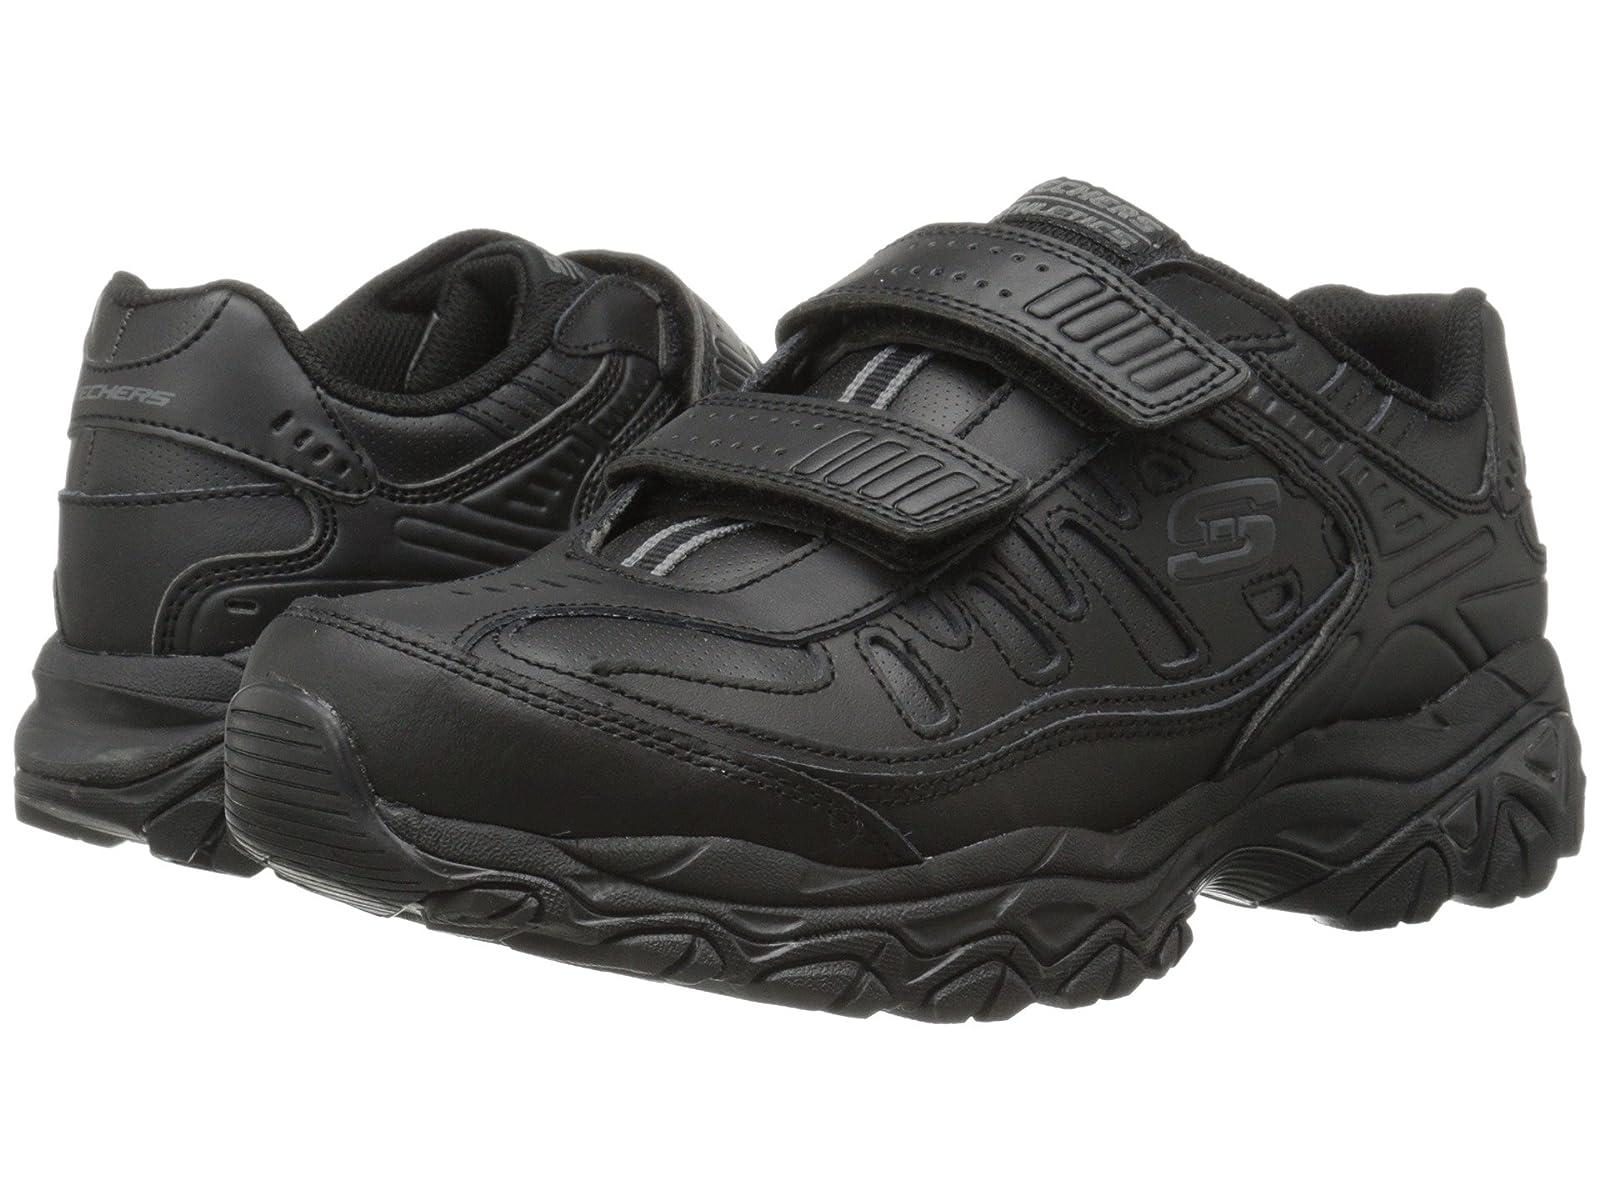 SKECHERS Afterburn M. Fit Stike OnAtmospheric grades have affordable shoes